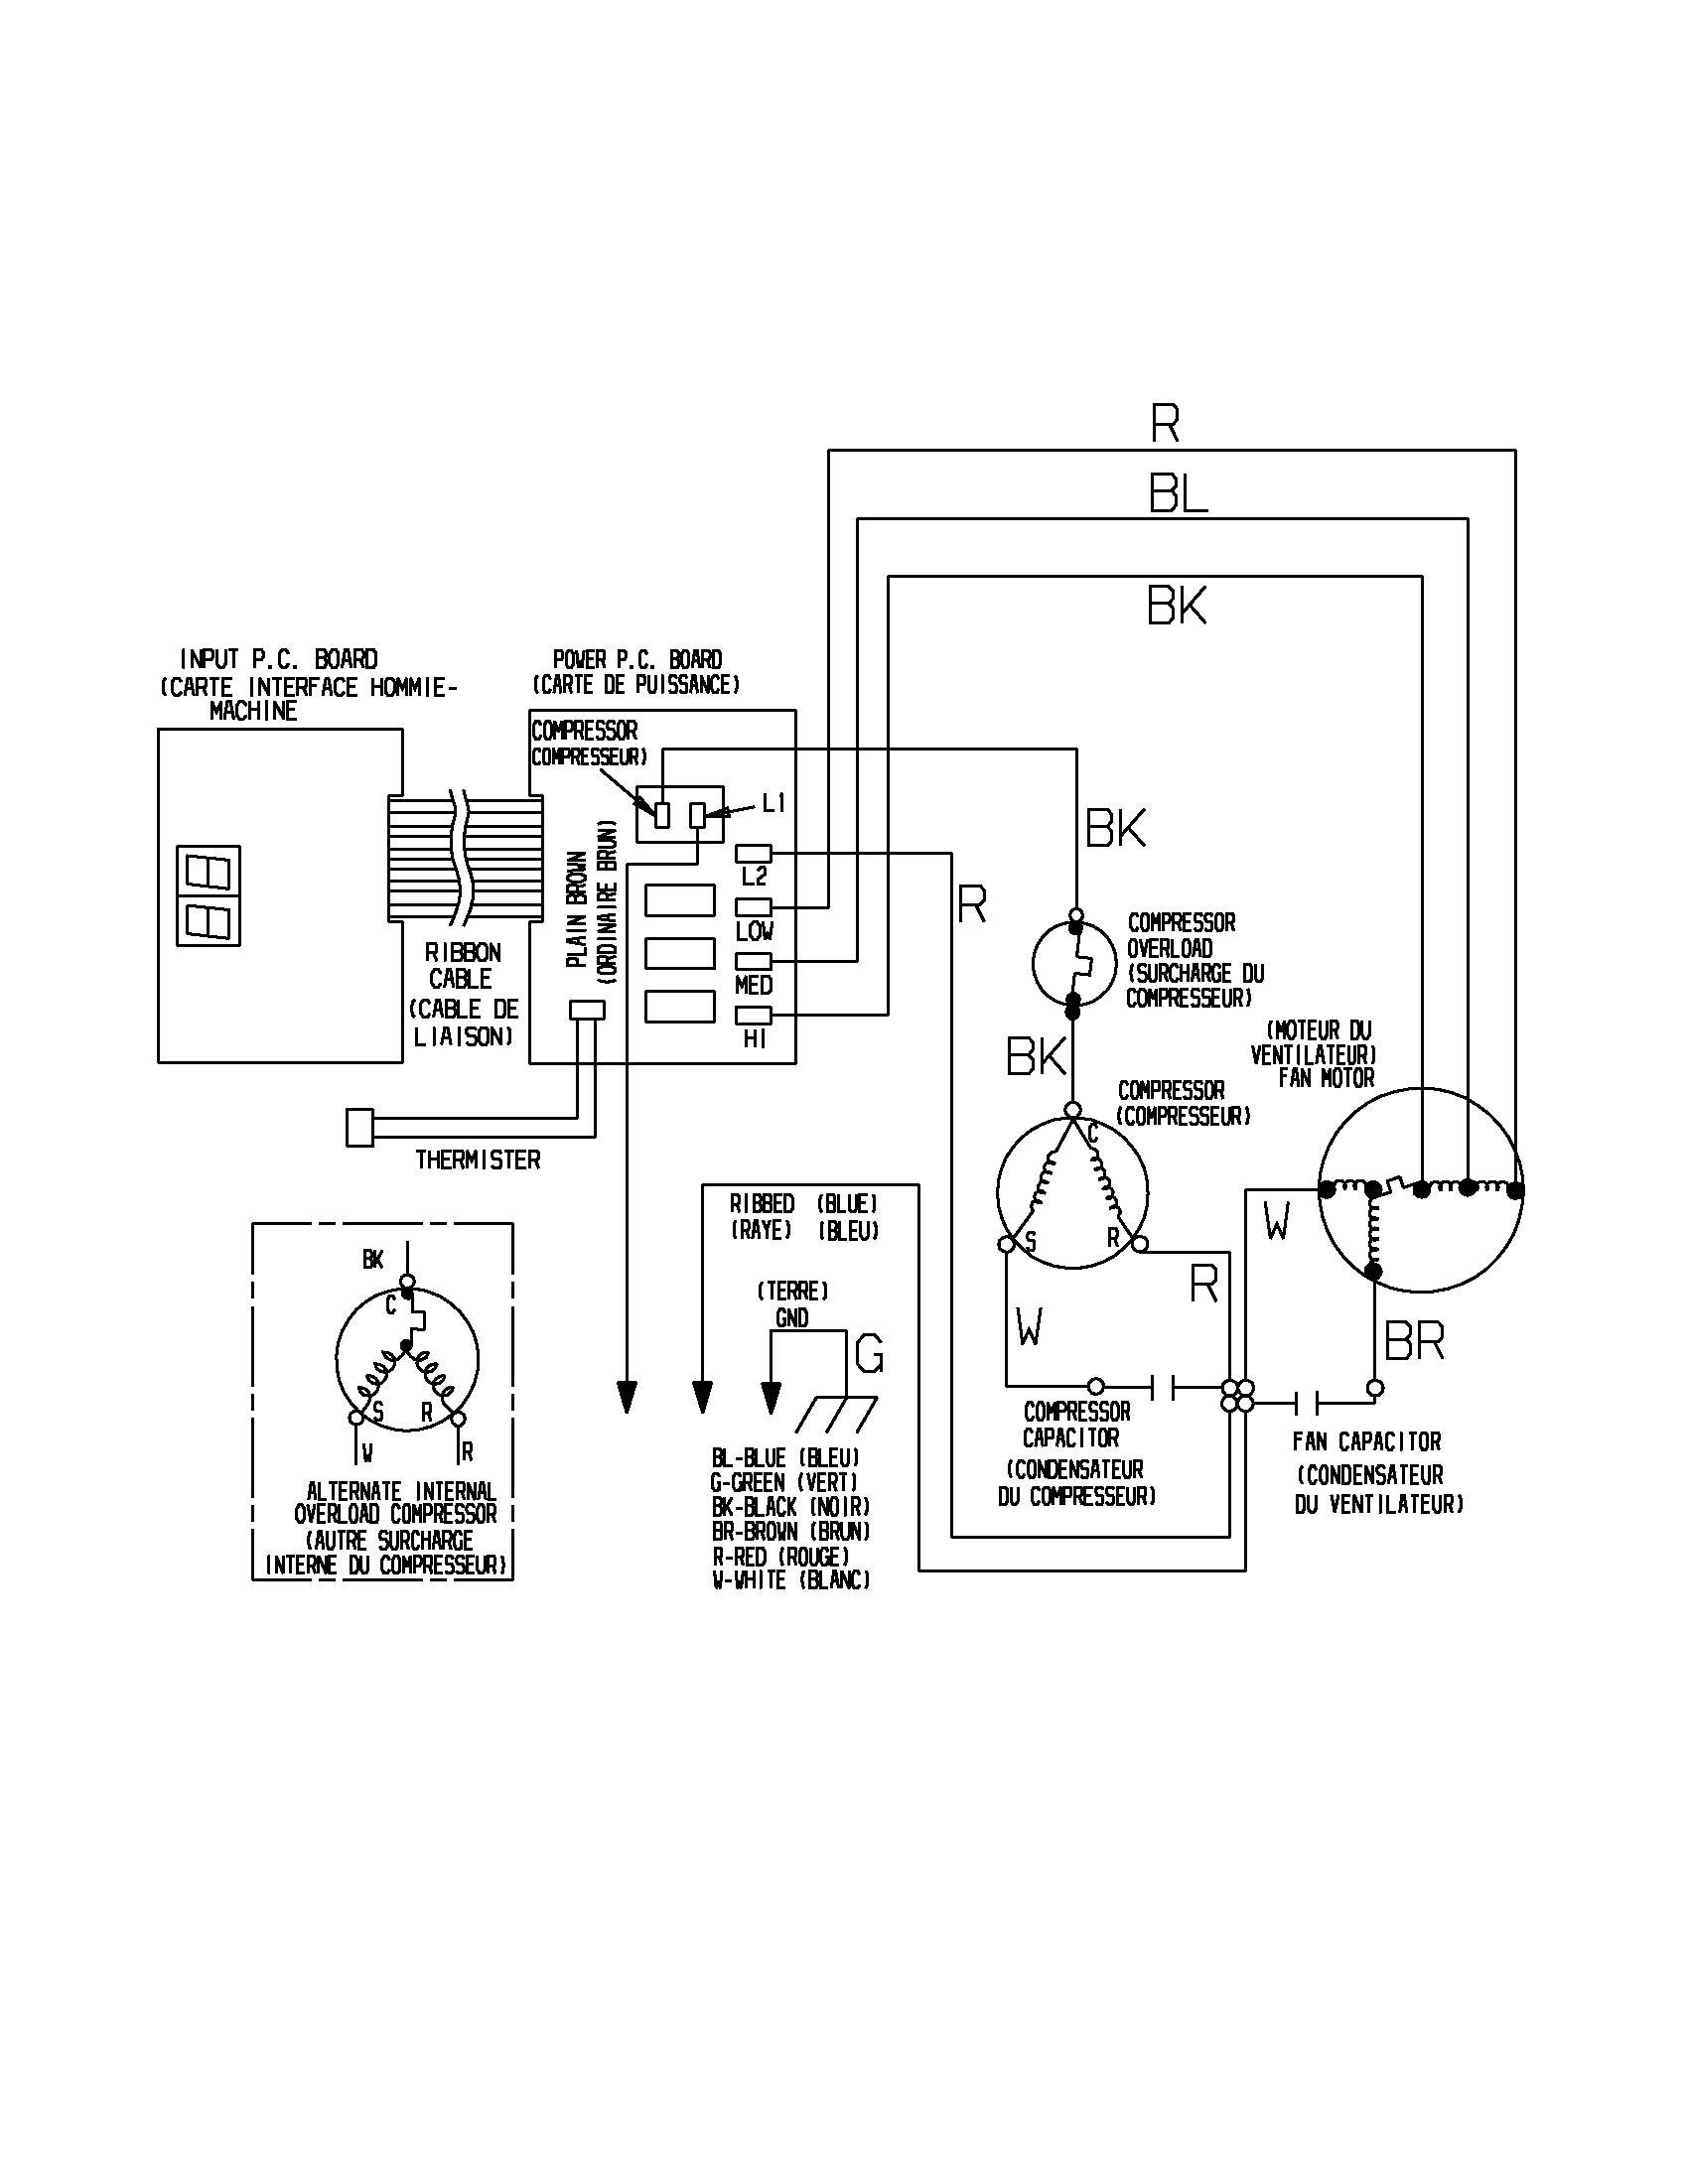 hight resolution of 5 hp compressor motor wiring diagram circuitdata mx tl ac compressor fan motor wiringmotor34jpg